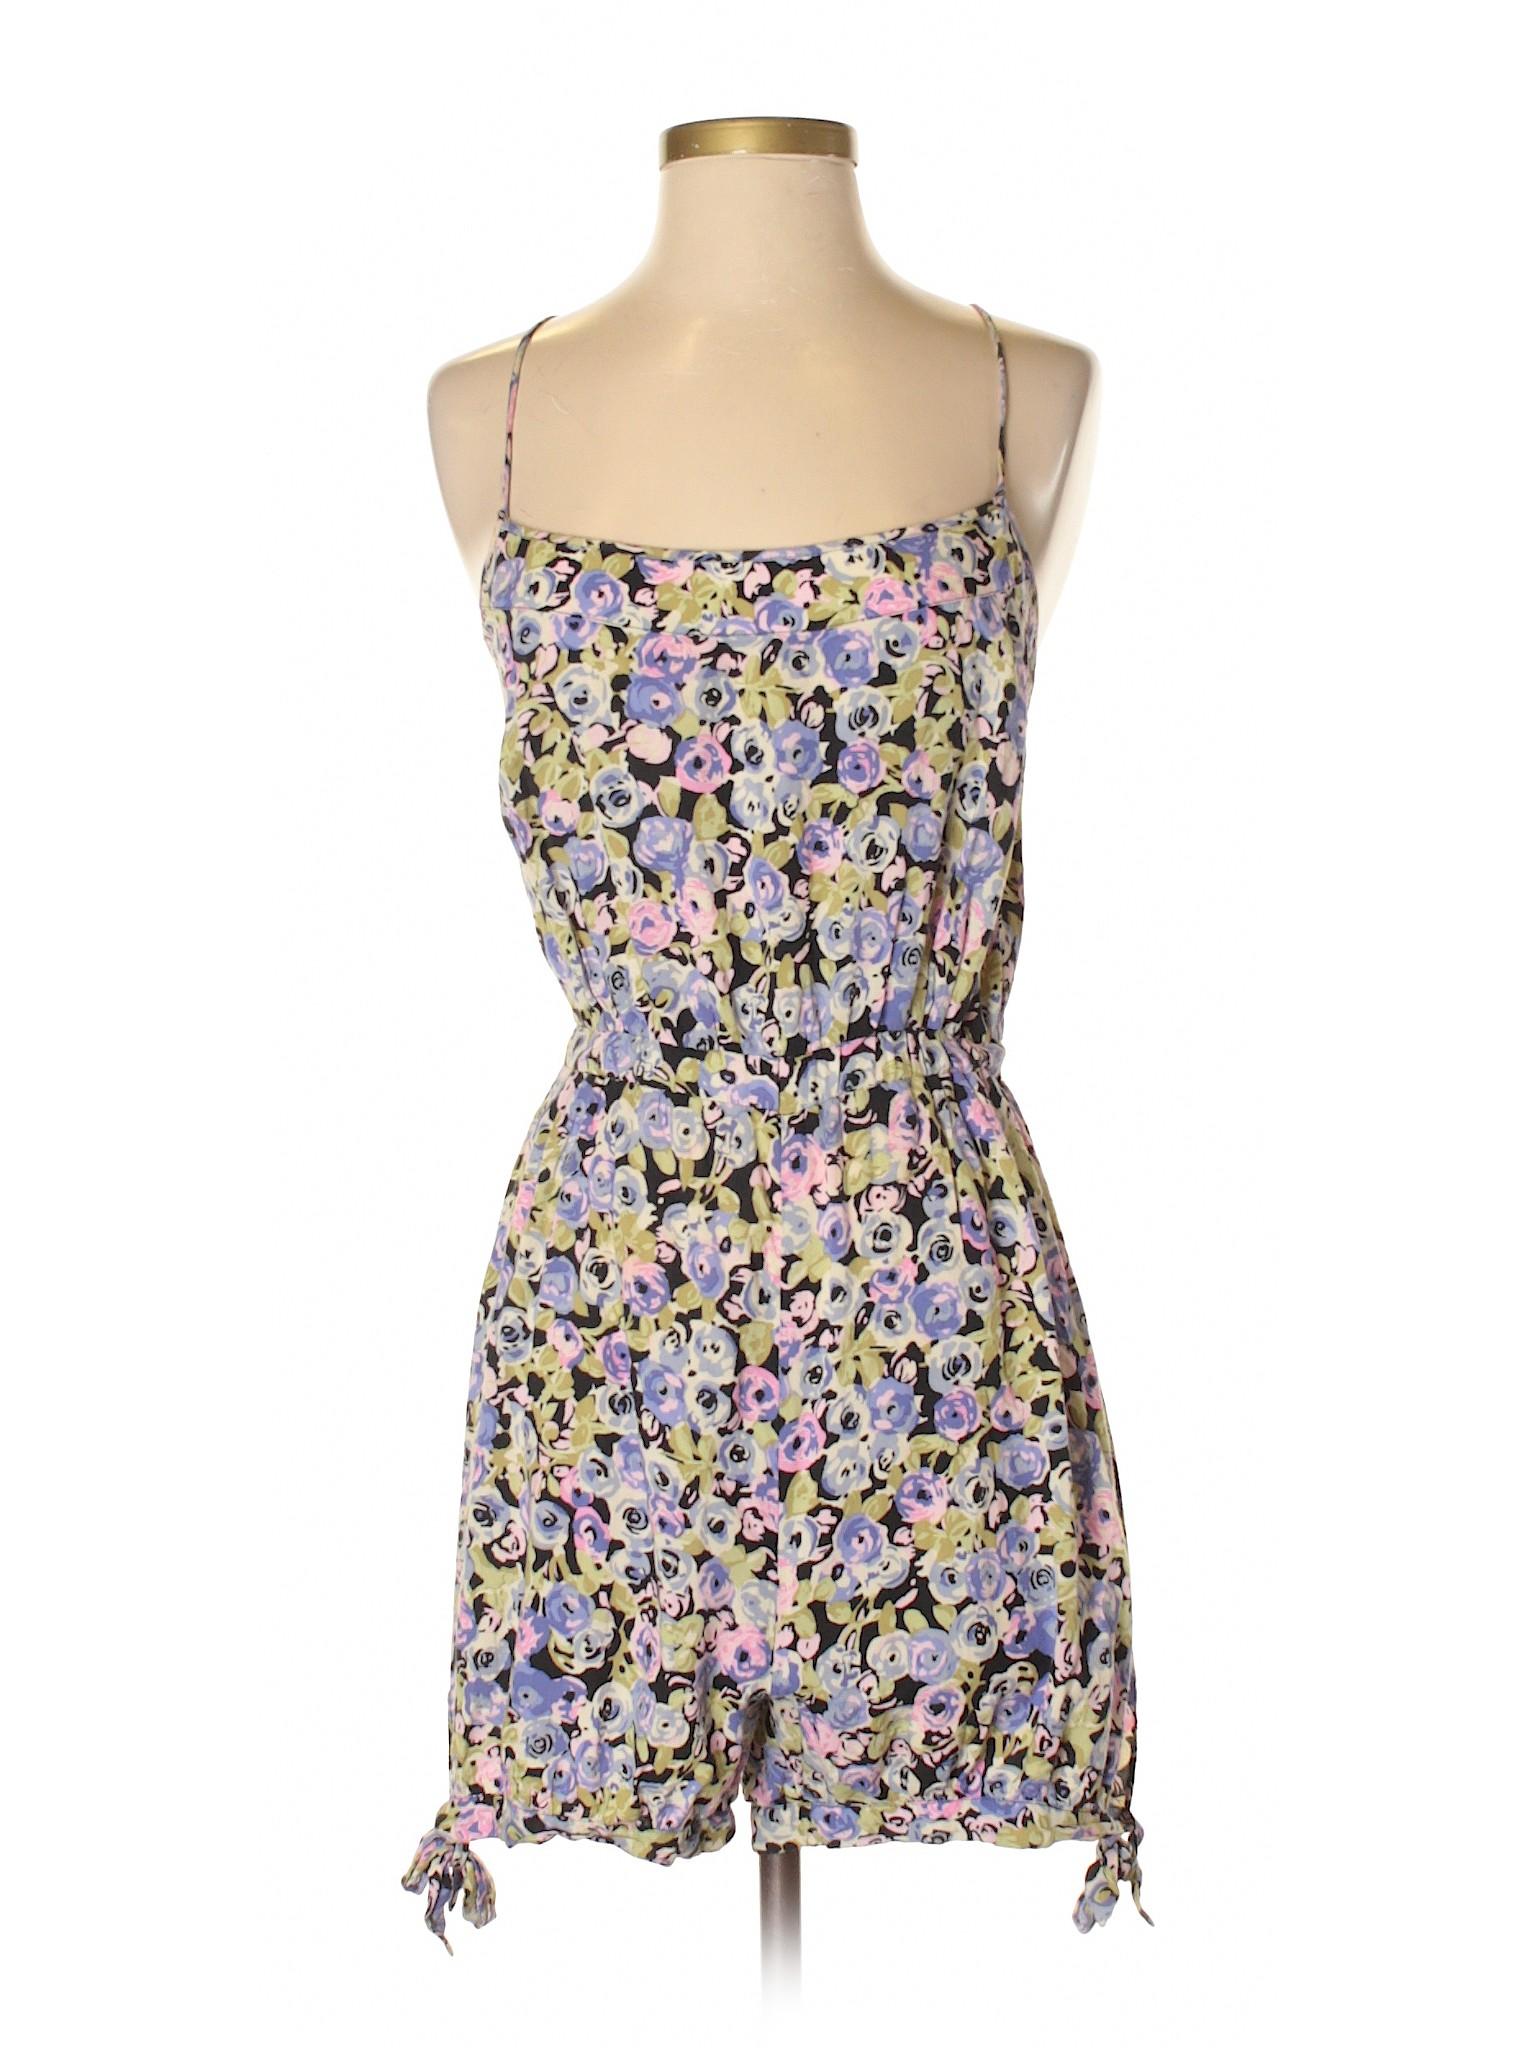 Moda Dress International Casual Boutique winter x5f4q0wxY